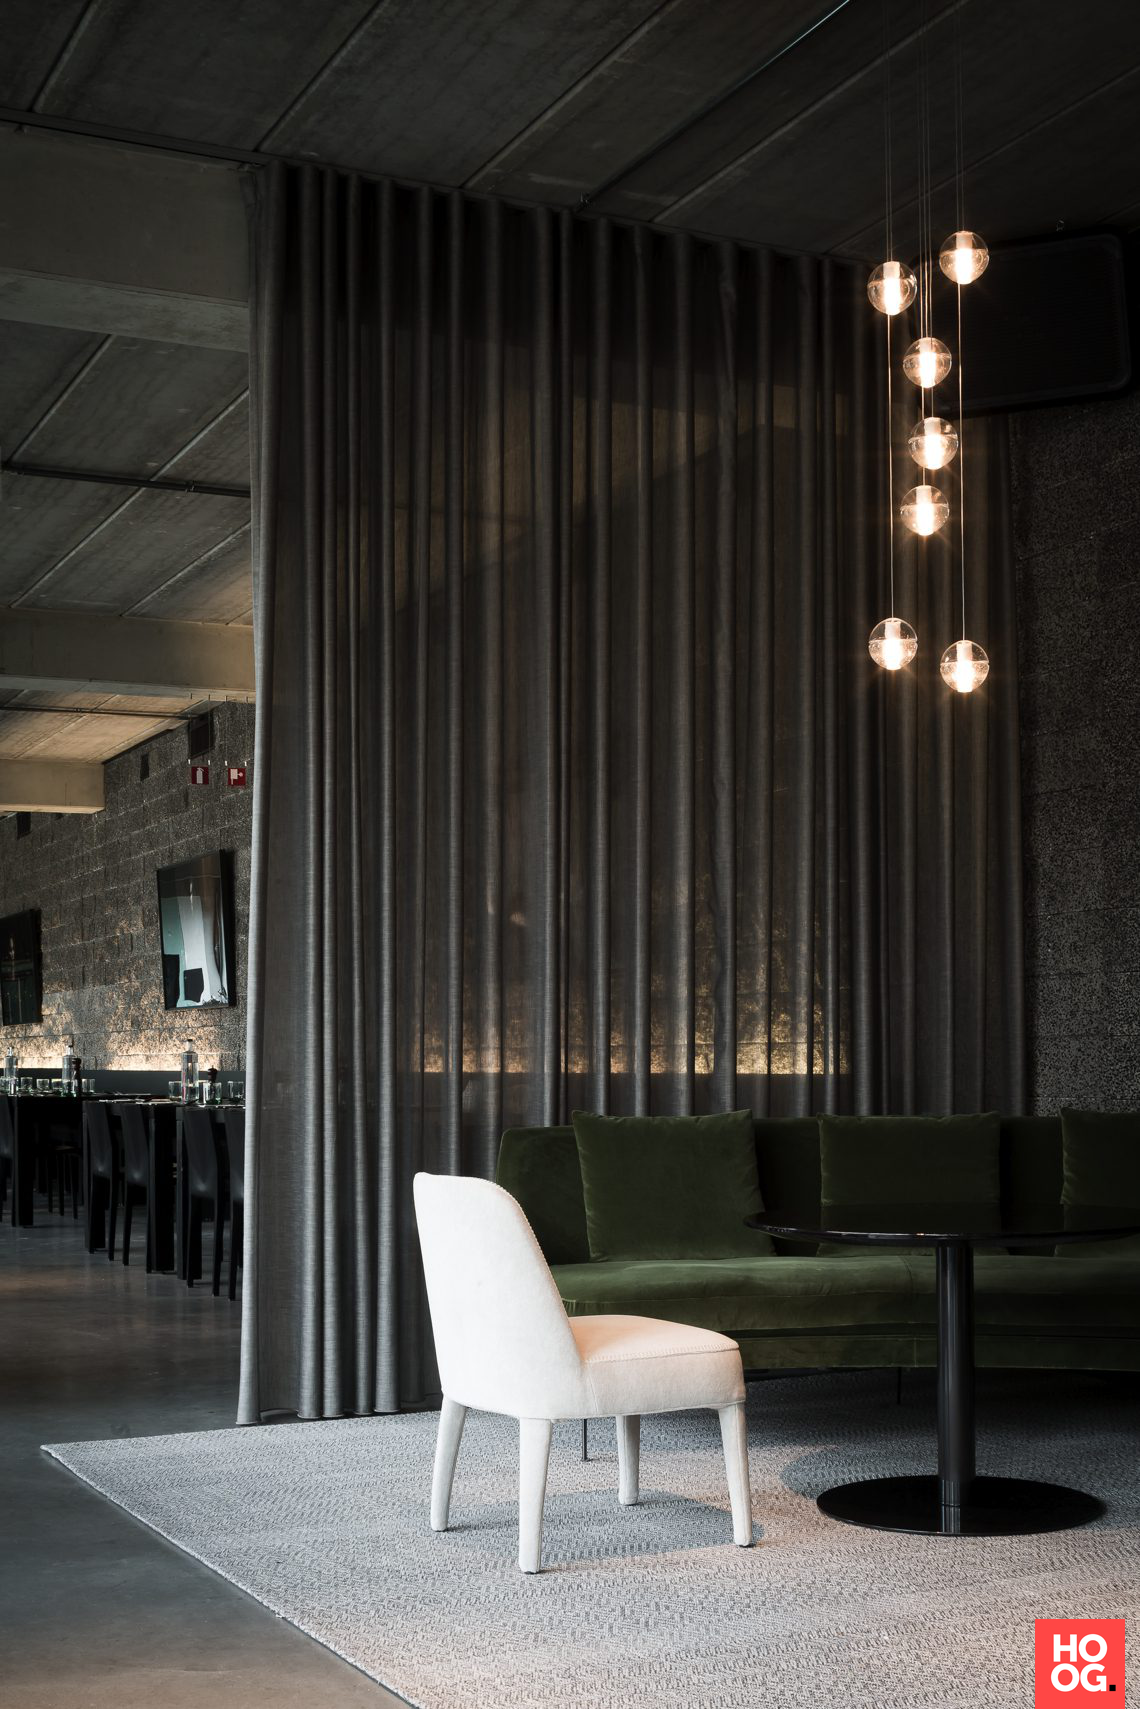 Devos interieur - Fashionclub Antwerpen - Hoog □ Exclusieve woon ...